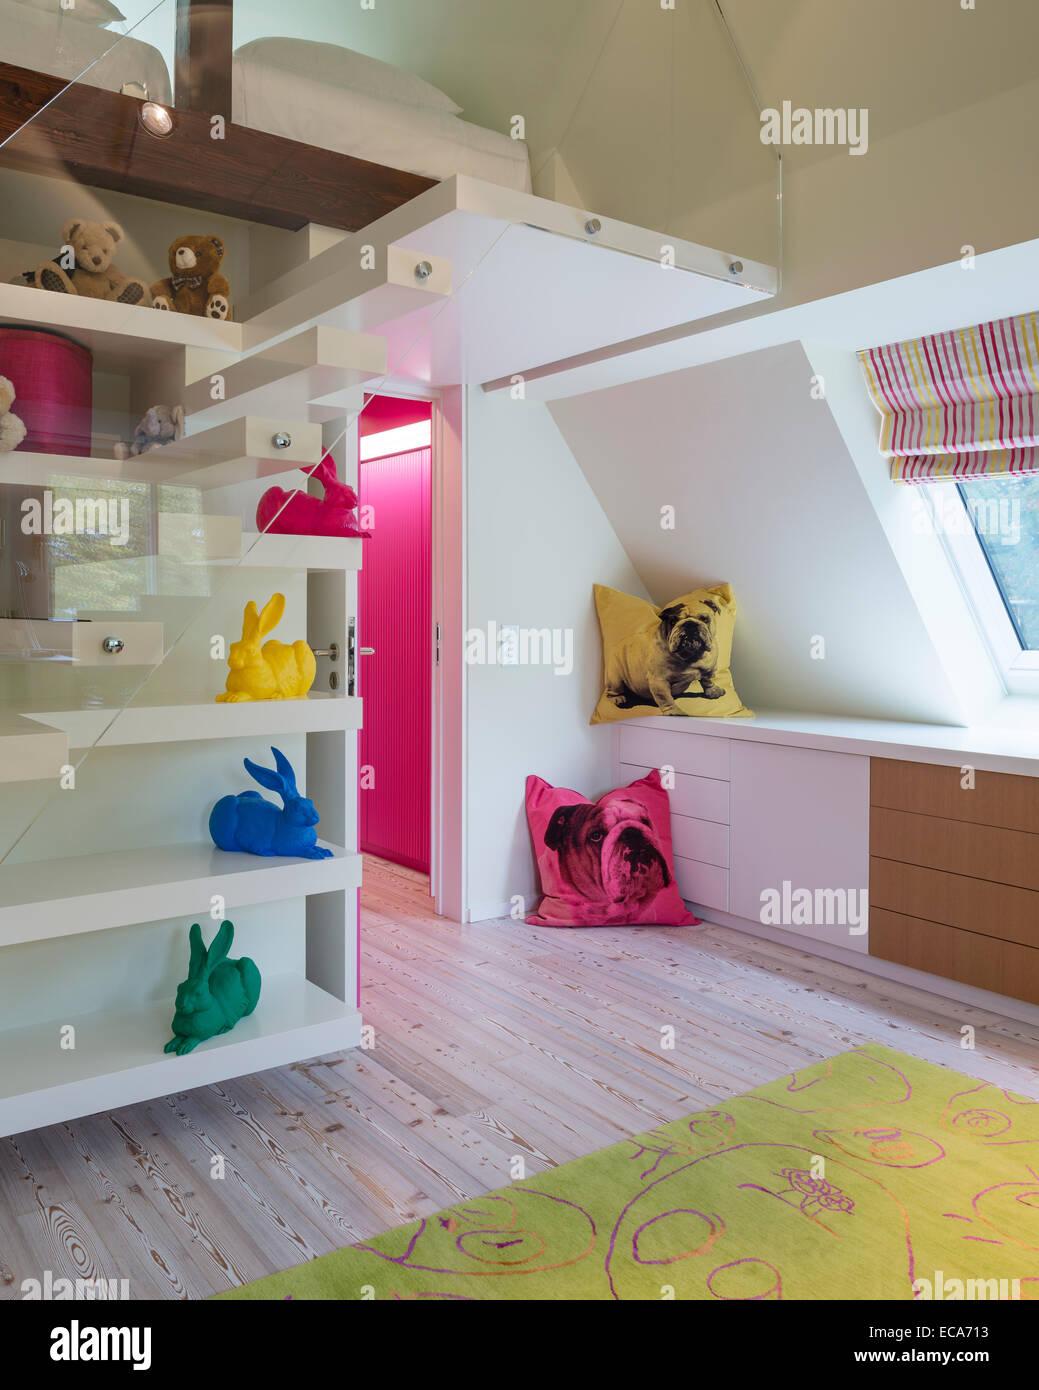 Bulldog print Kissen und Mauerstruktur farbig Dürer Hasen Künstlers Ottmar Horl im Kinderschlafzimmer Stockbild